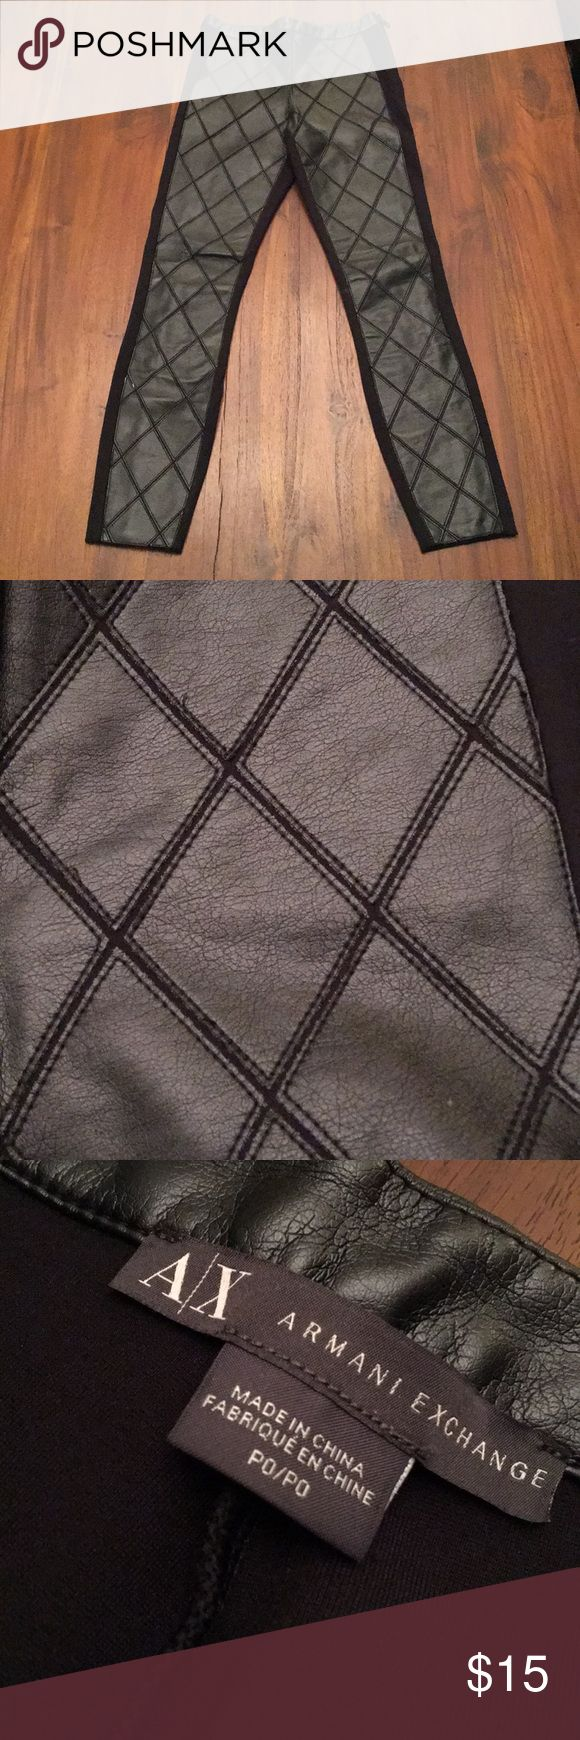 Armani Exchange leggings Armani Exchange faux leather and pointe leggings. GUC. No holes, tears, rips. Petite size. P0. Zips up side waist. A/X Armani Exchange Pants Leggings